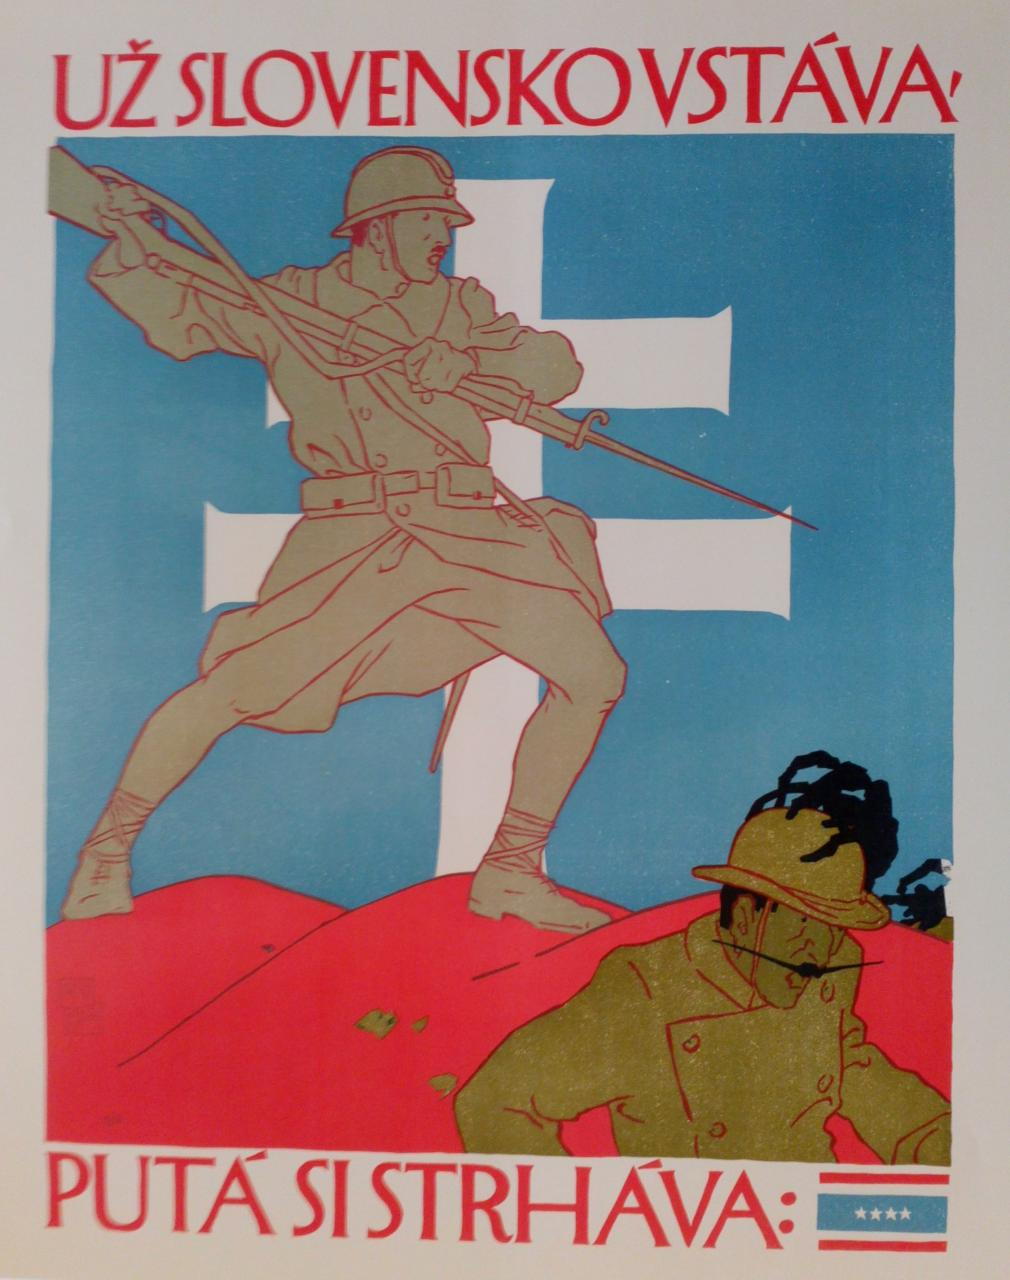 Uz.Slovensko.Vstava.Puta.Si.Strhava